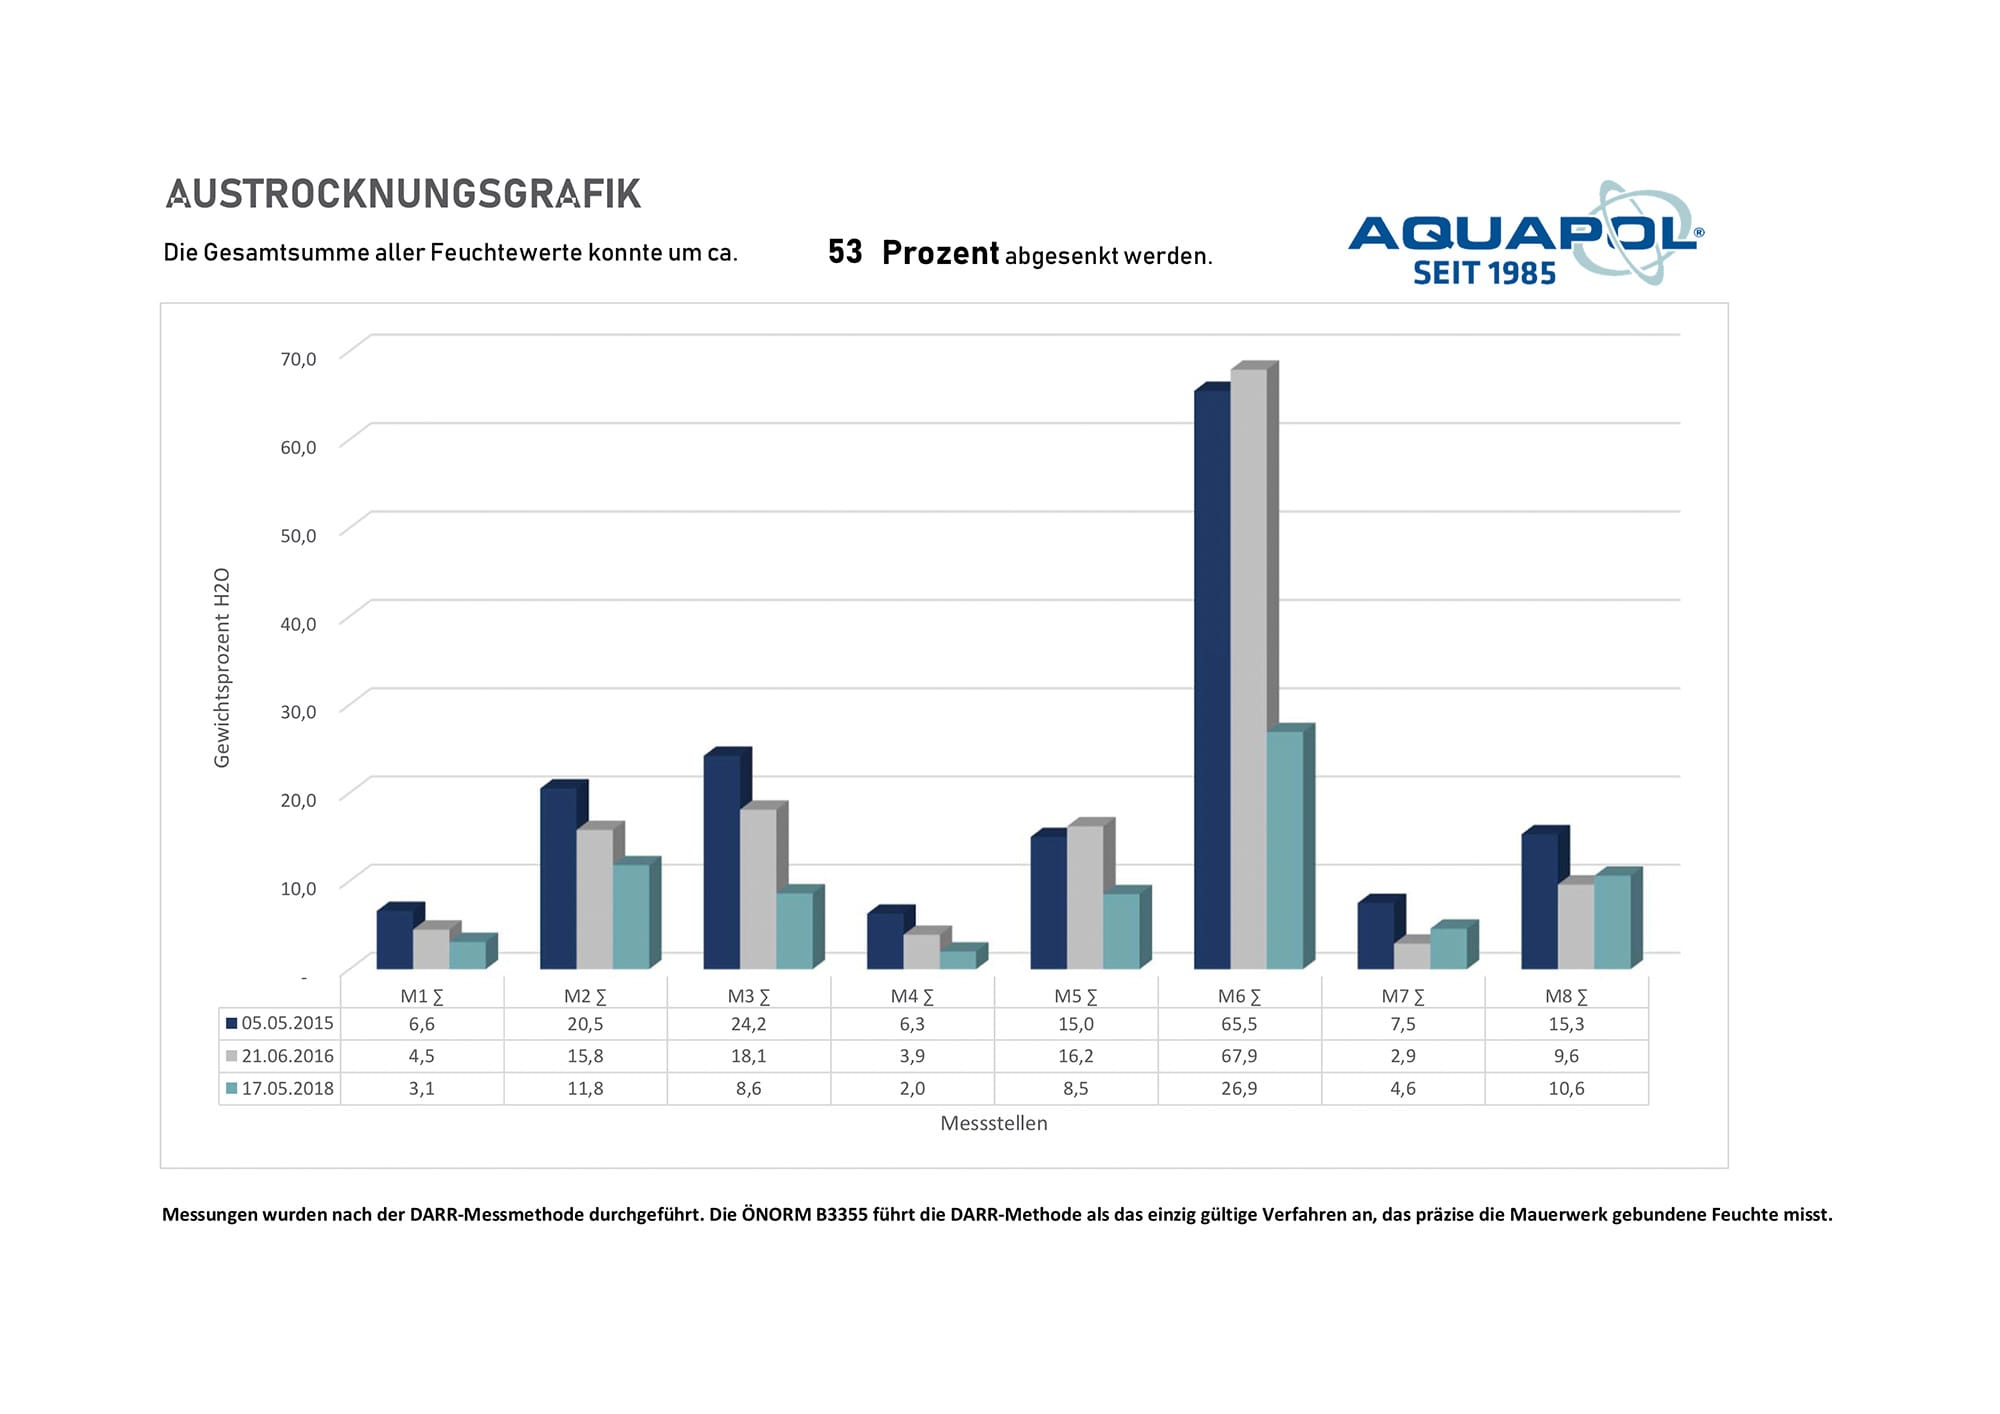 Aquapol Austrocknungsgrafik